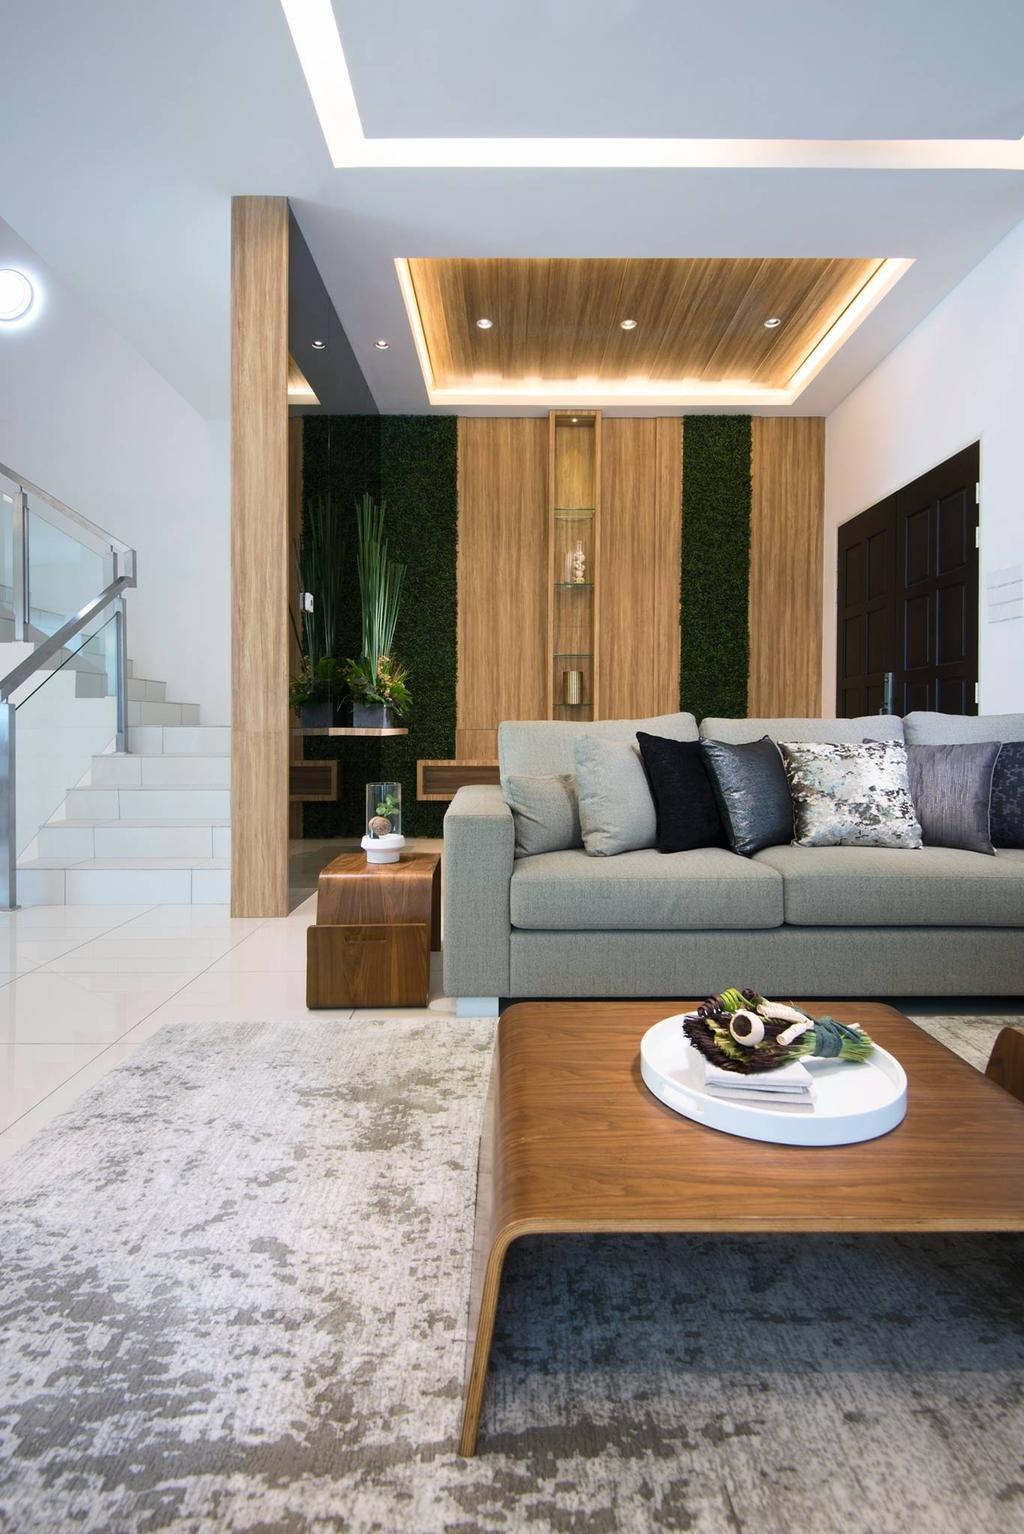 Landed, Batu Maung, Penang, Interior Designer, Nevermore Group, Flora, Jar, Plant, Potted Plant, Pottery, Vase, Couch, Furniture, Banister, Handrail